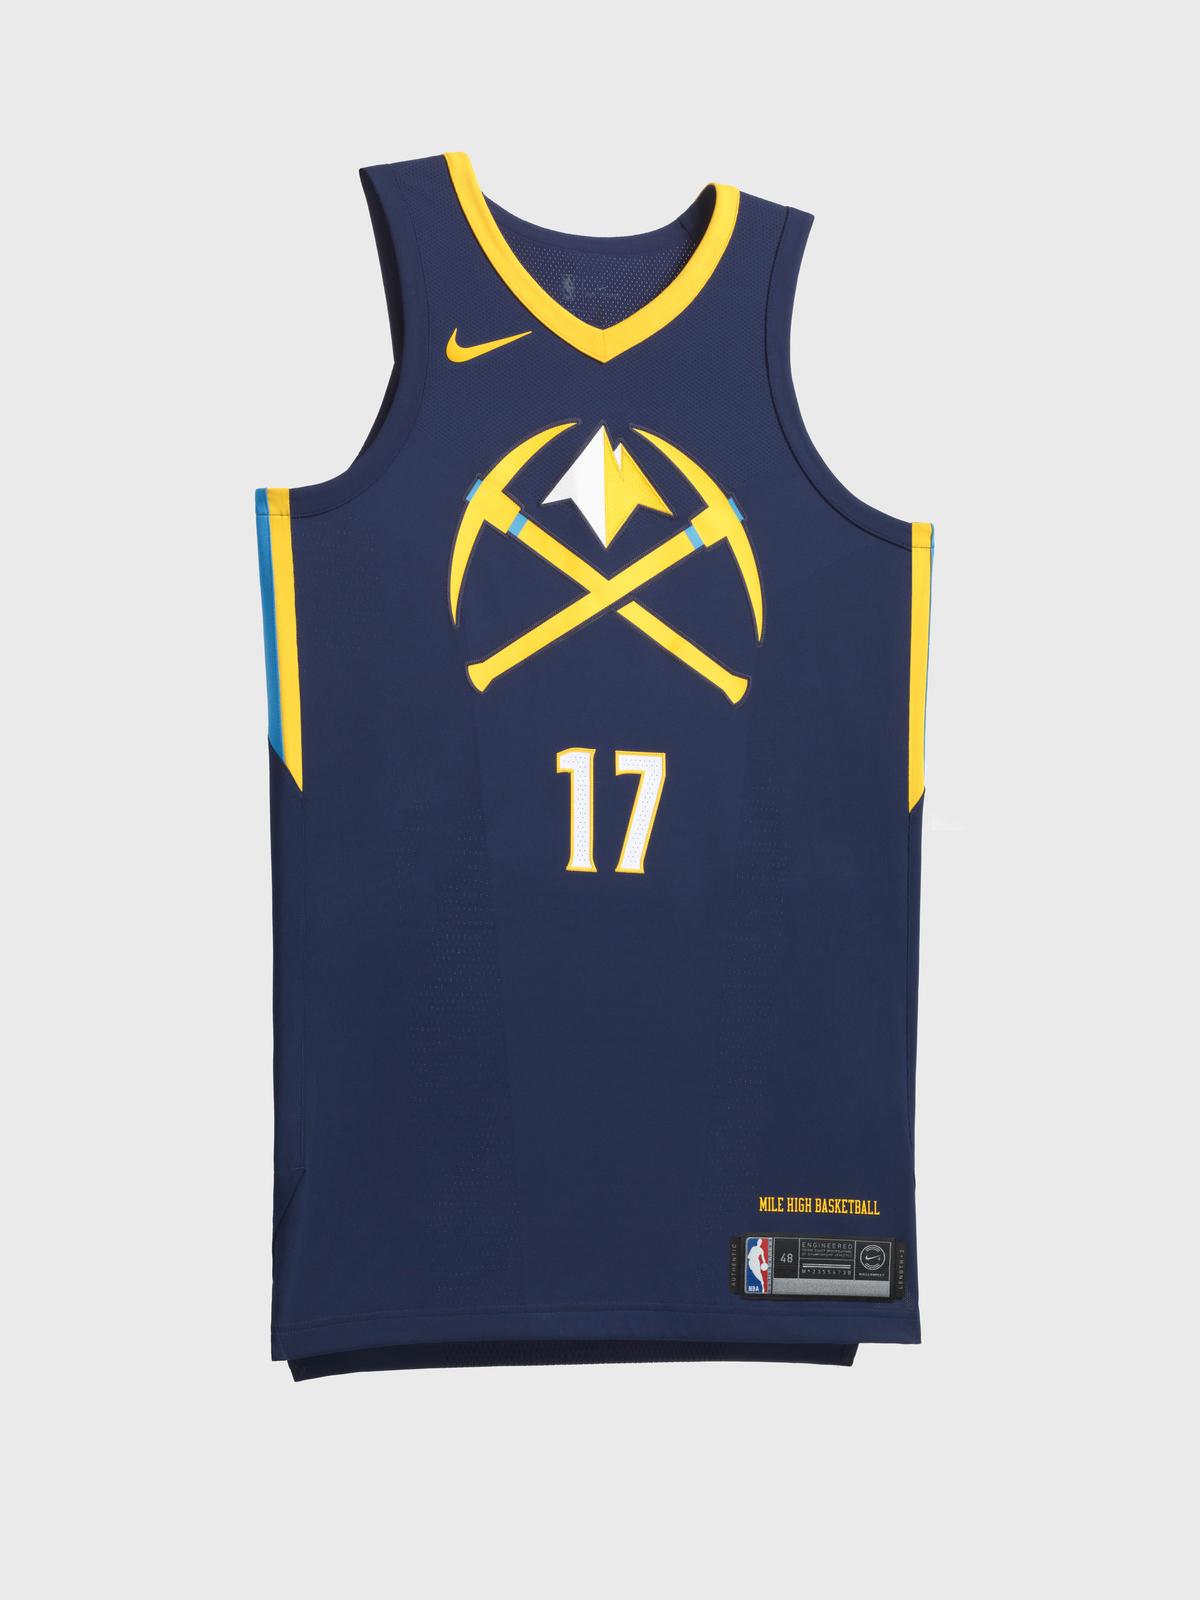 99c589292169 NBA City Edition jerseys  Photos of the final new Nike jersey